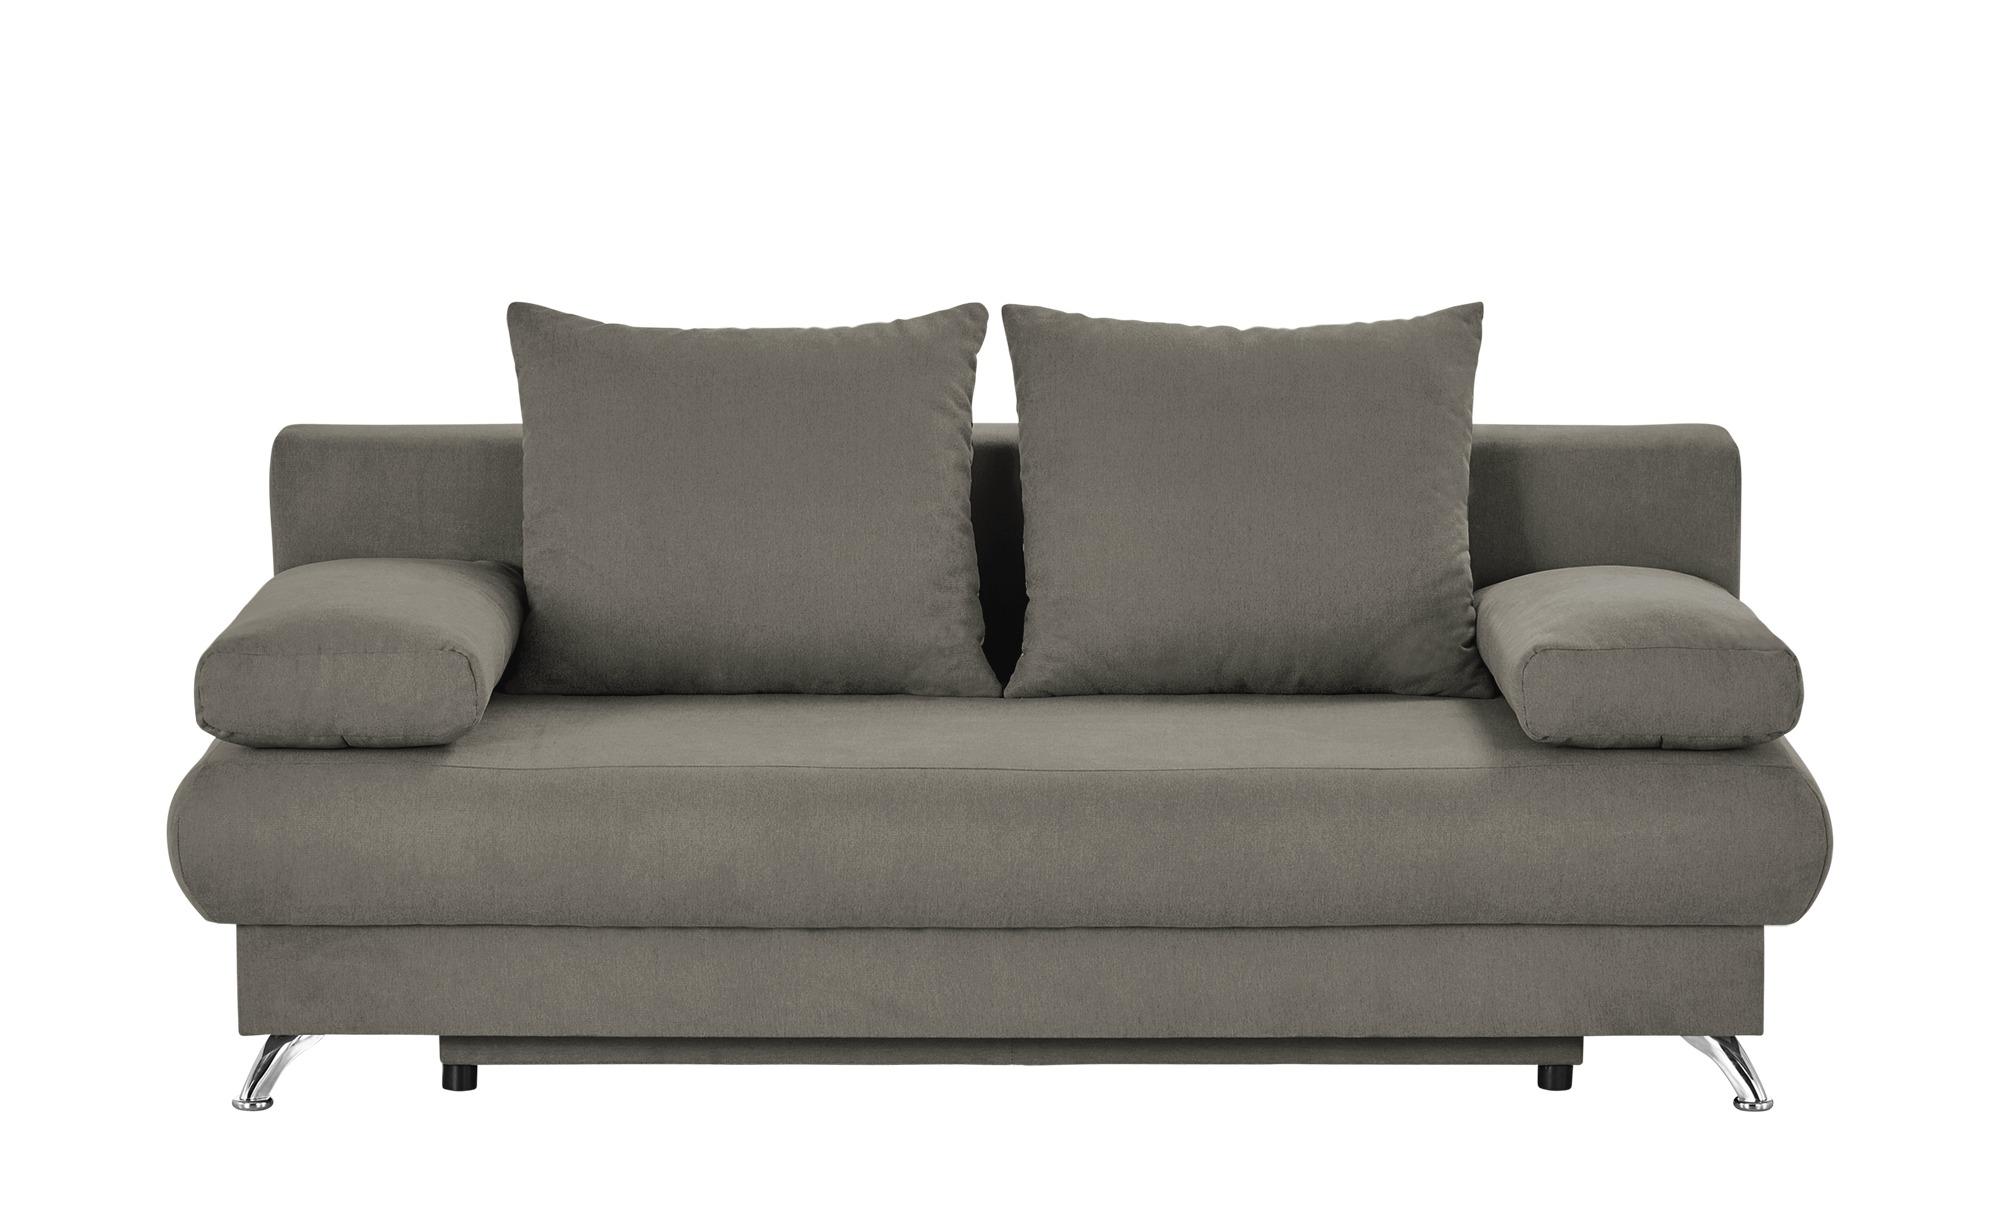 Schlafsofa grau-braun - Flachgewebe Viola ¦ grau ¦ Maße (cm): B: 203 H: 72 T: 93 Polstermöbel > Sofas > 2-Sitzer - Höffner